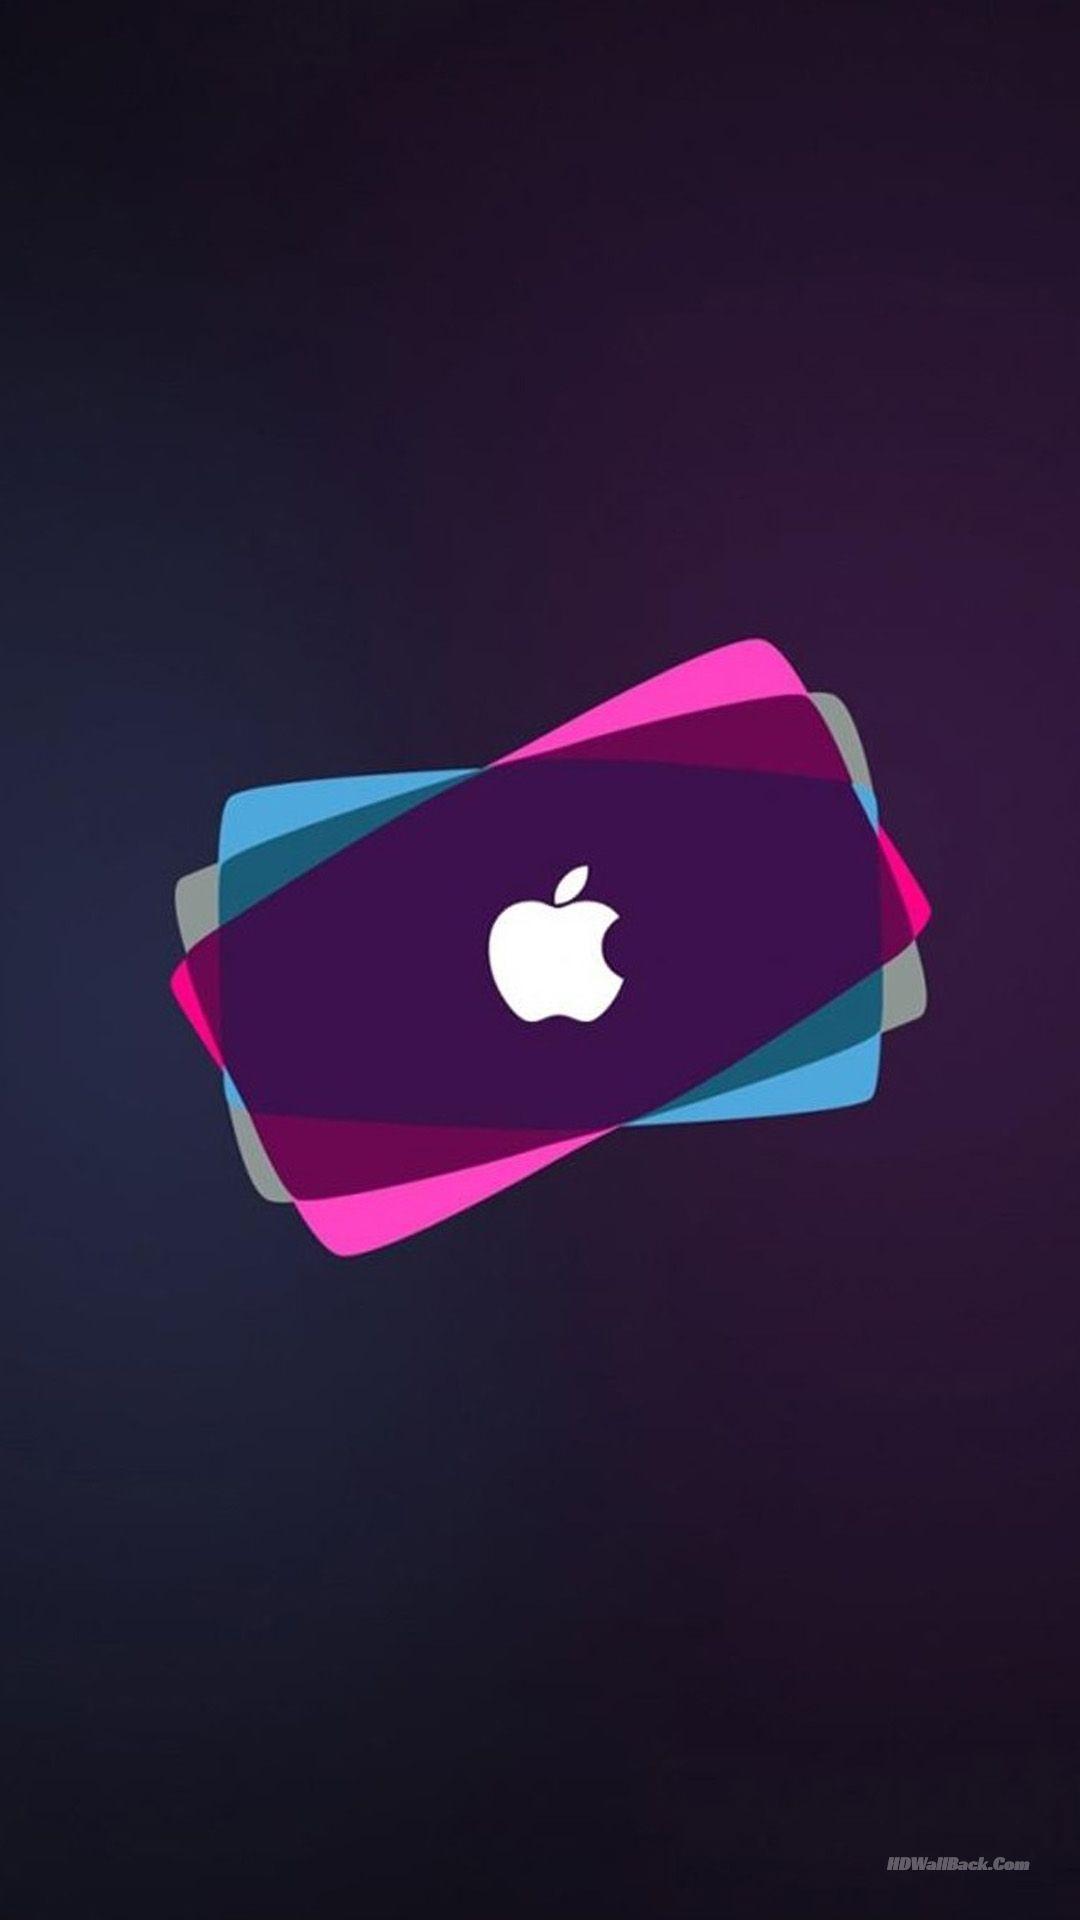 Apple Iphone 6 Plus Wallpapers Top Free Apple Iphone 6 Plus